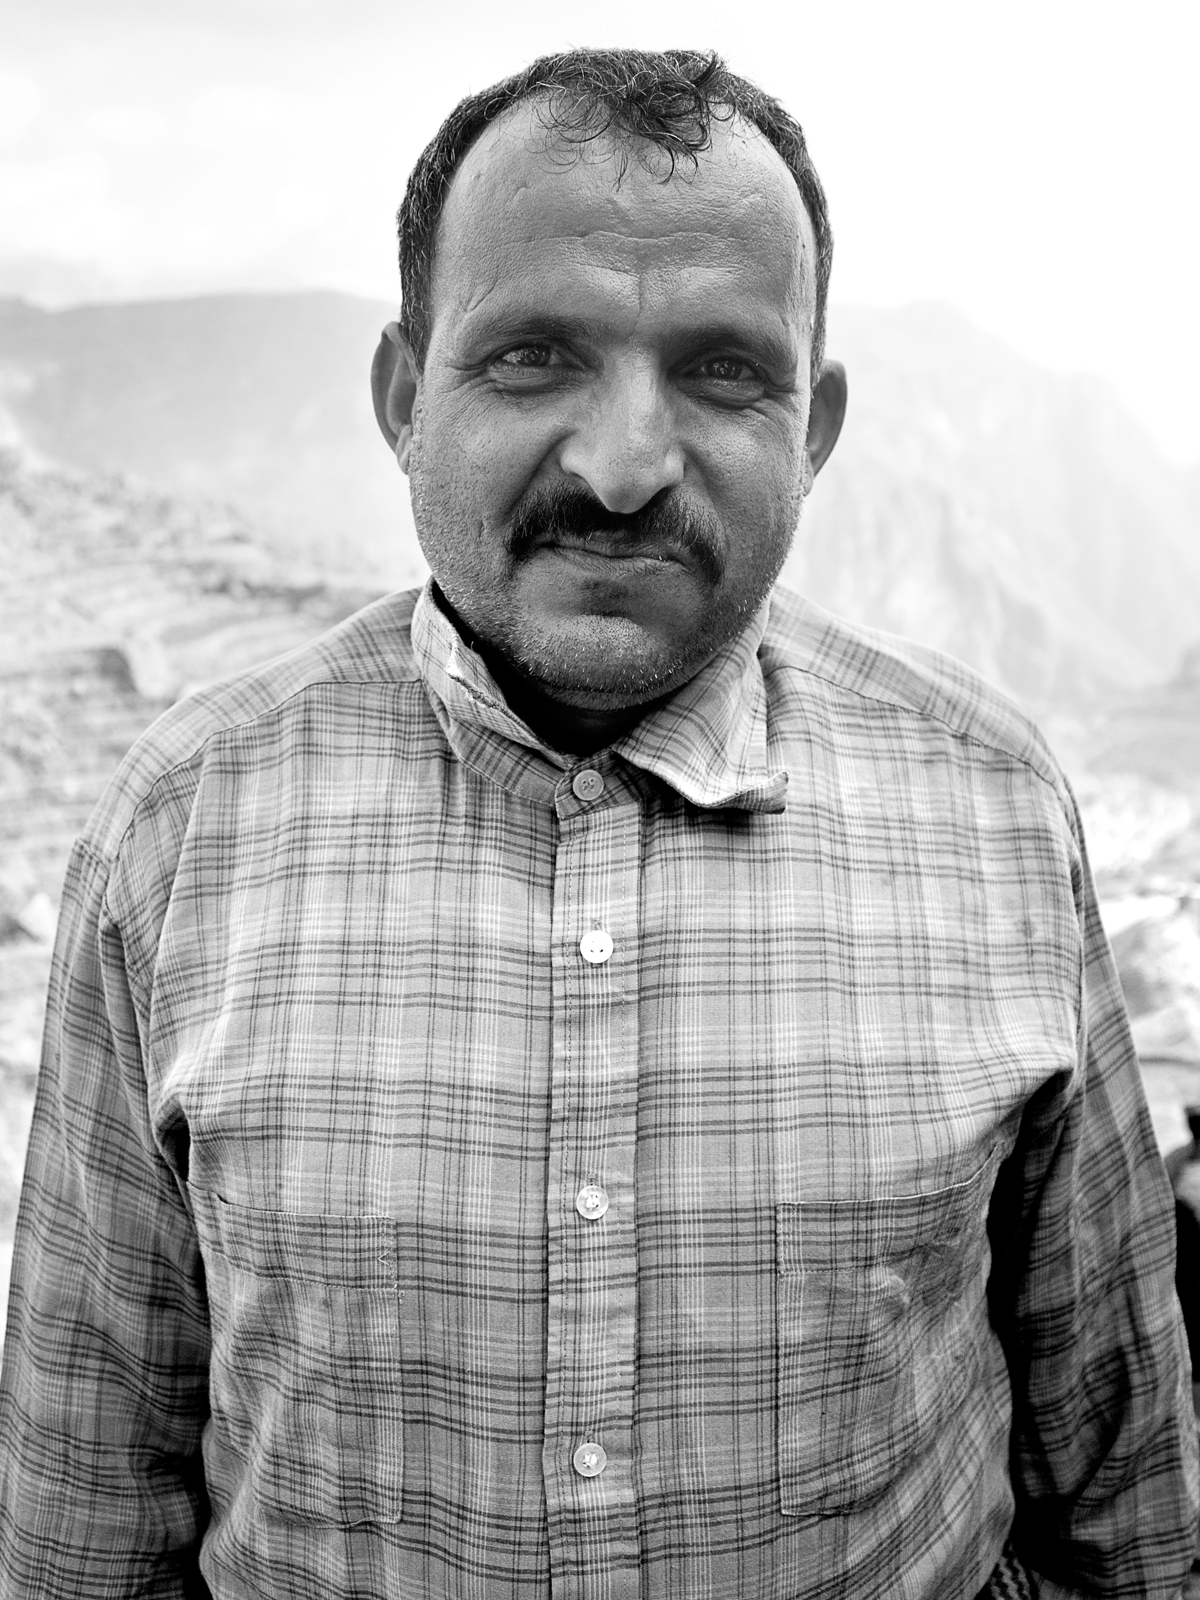 Abdulhakim-Mohsin-825.jpg